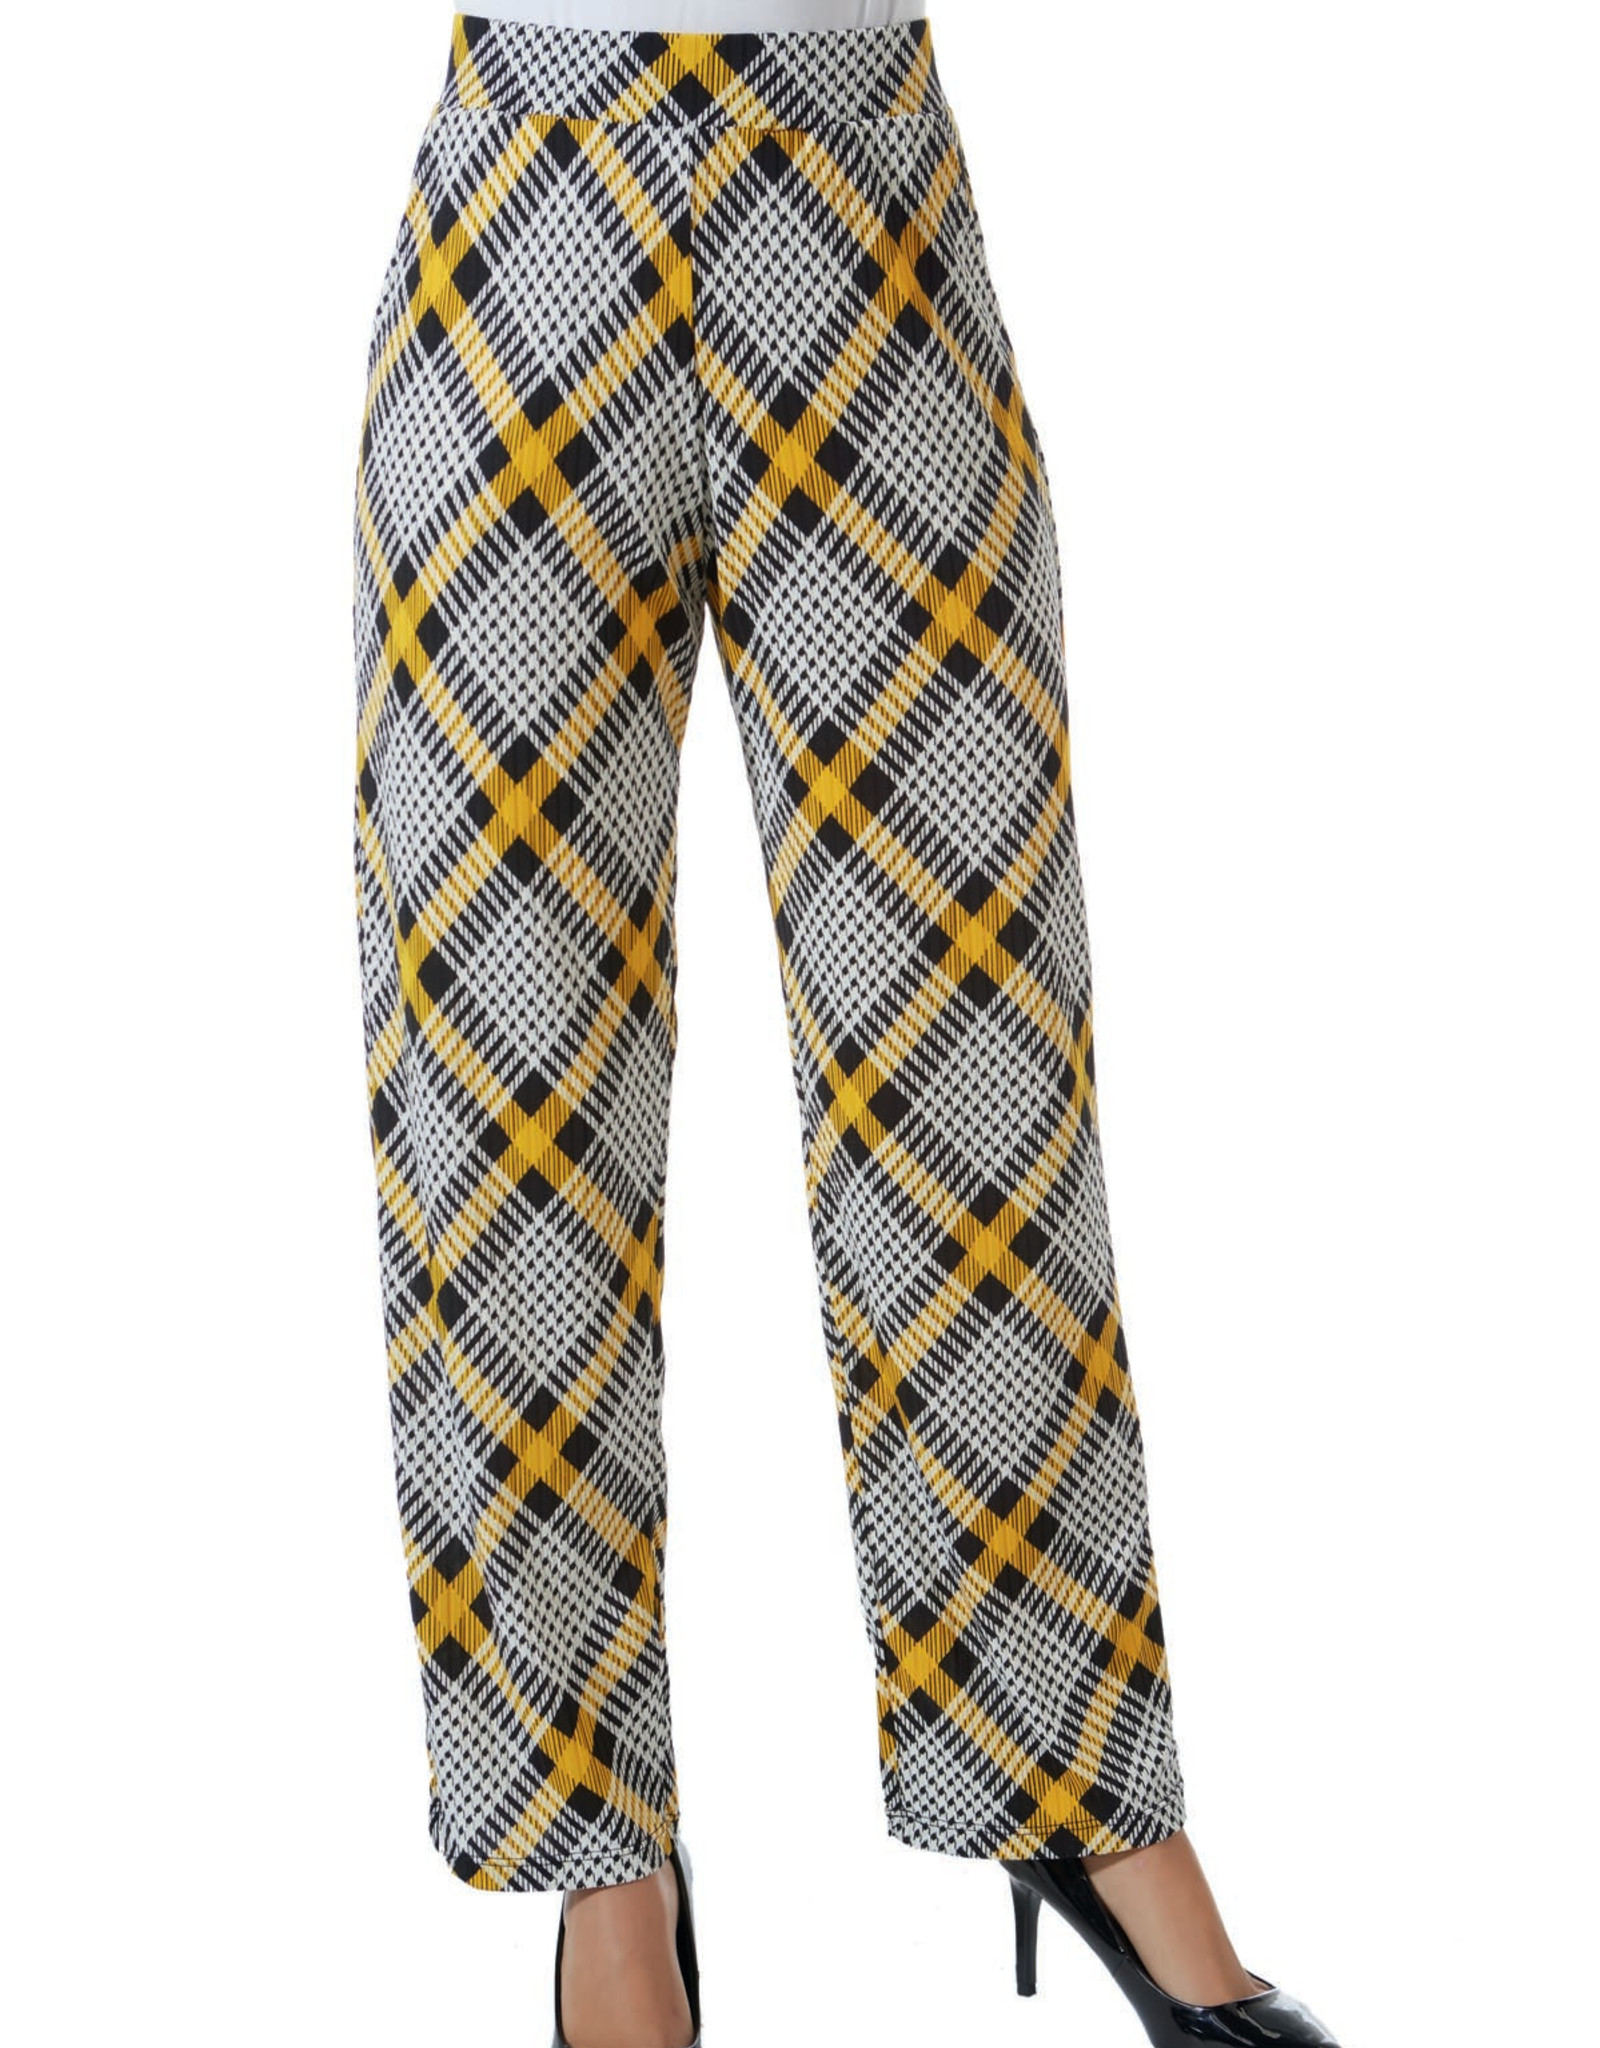 Janira Pantalon Loo Scott Janira avec Poches en Polyester LG25154